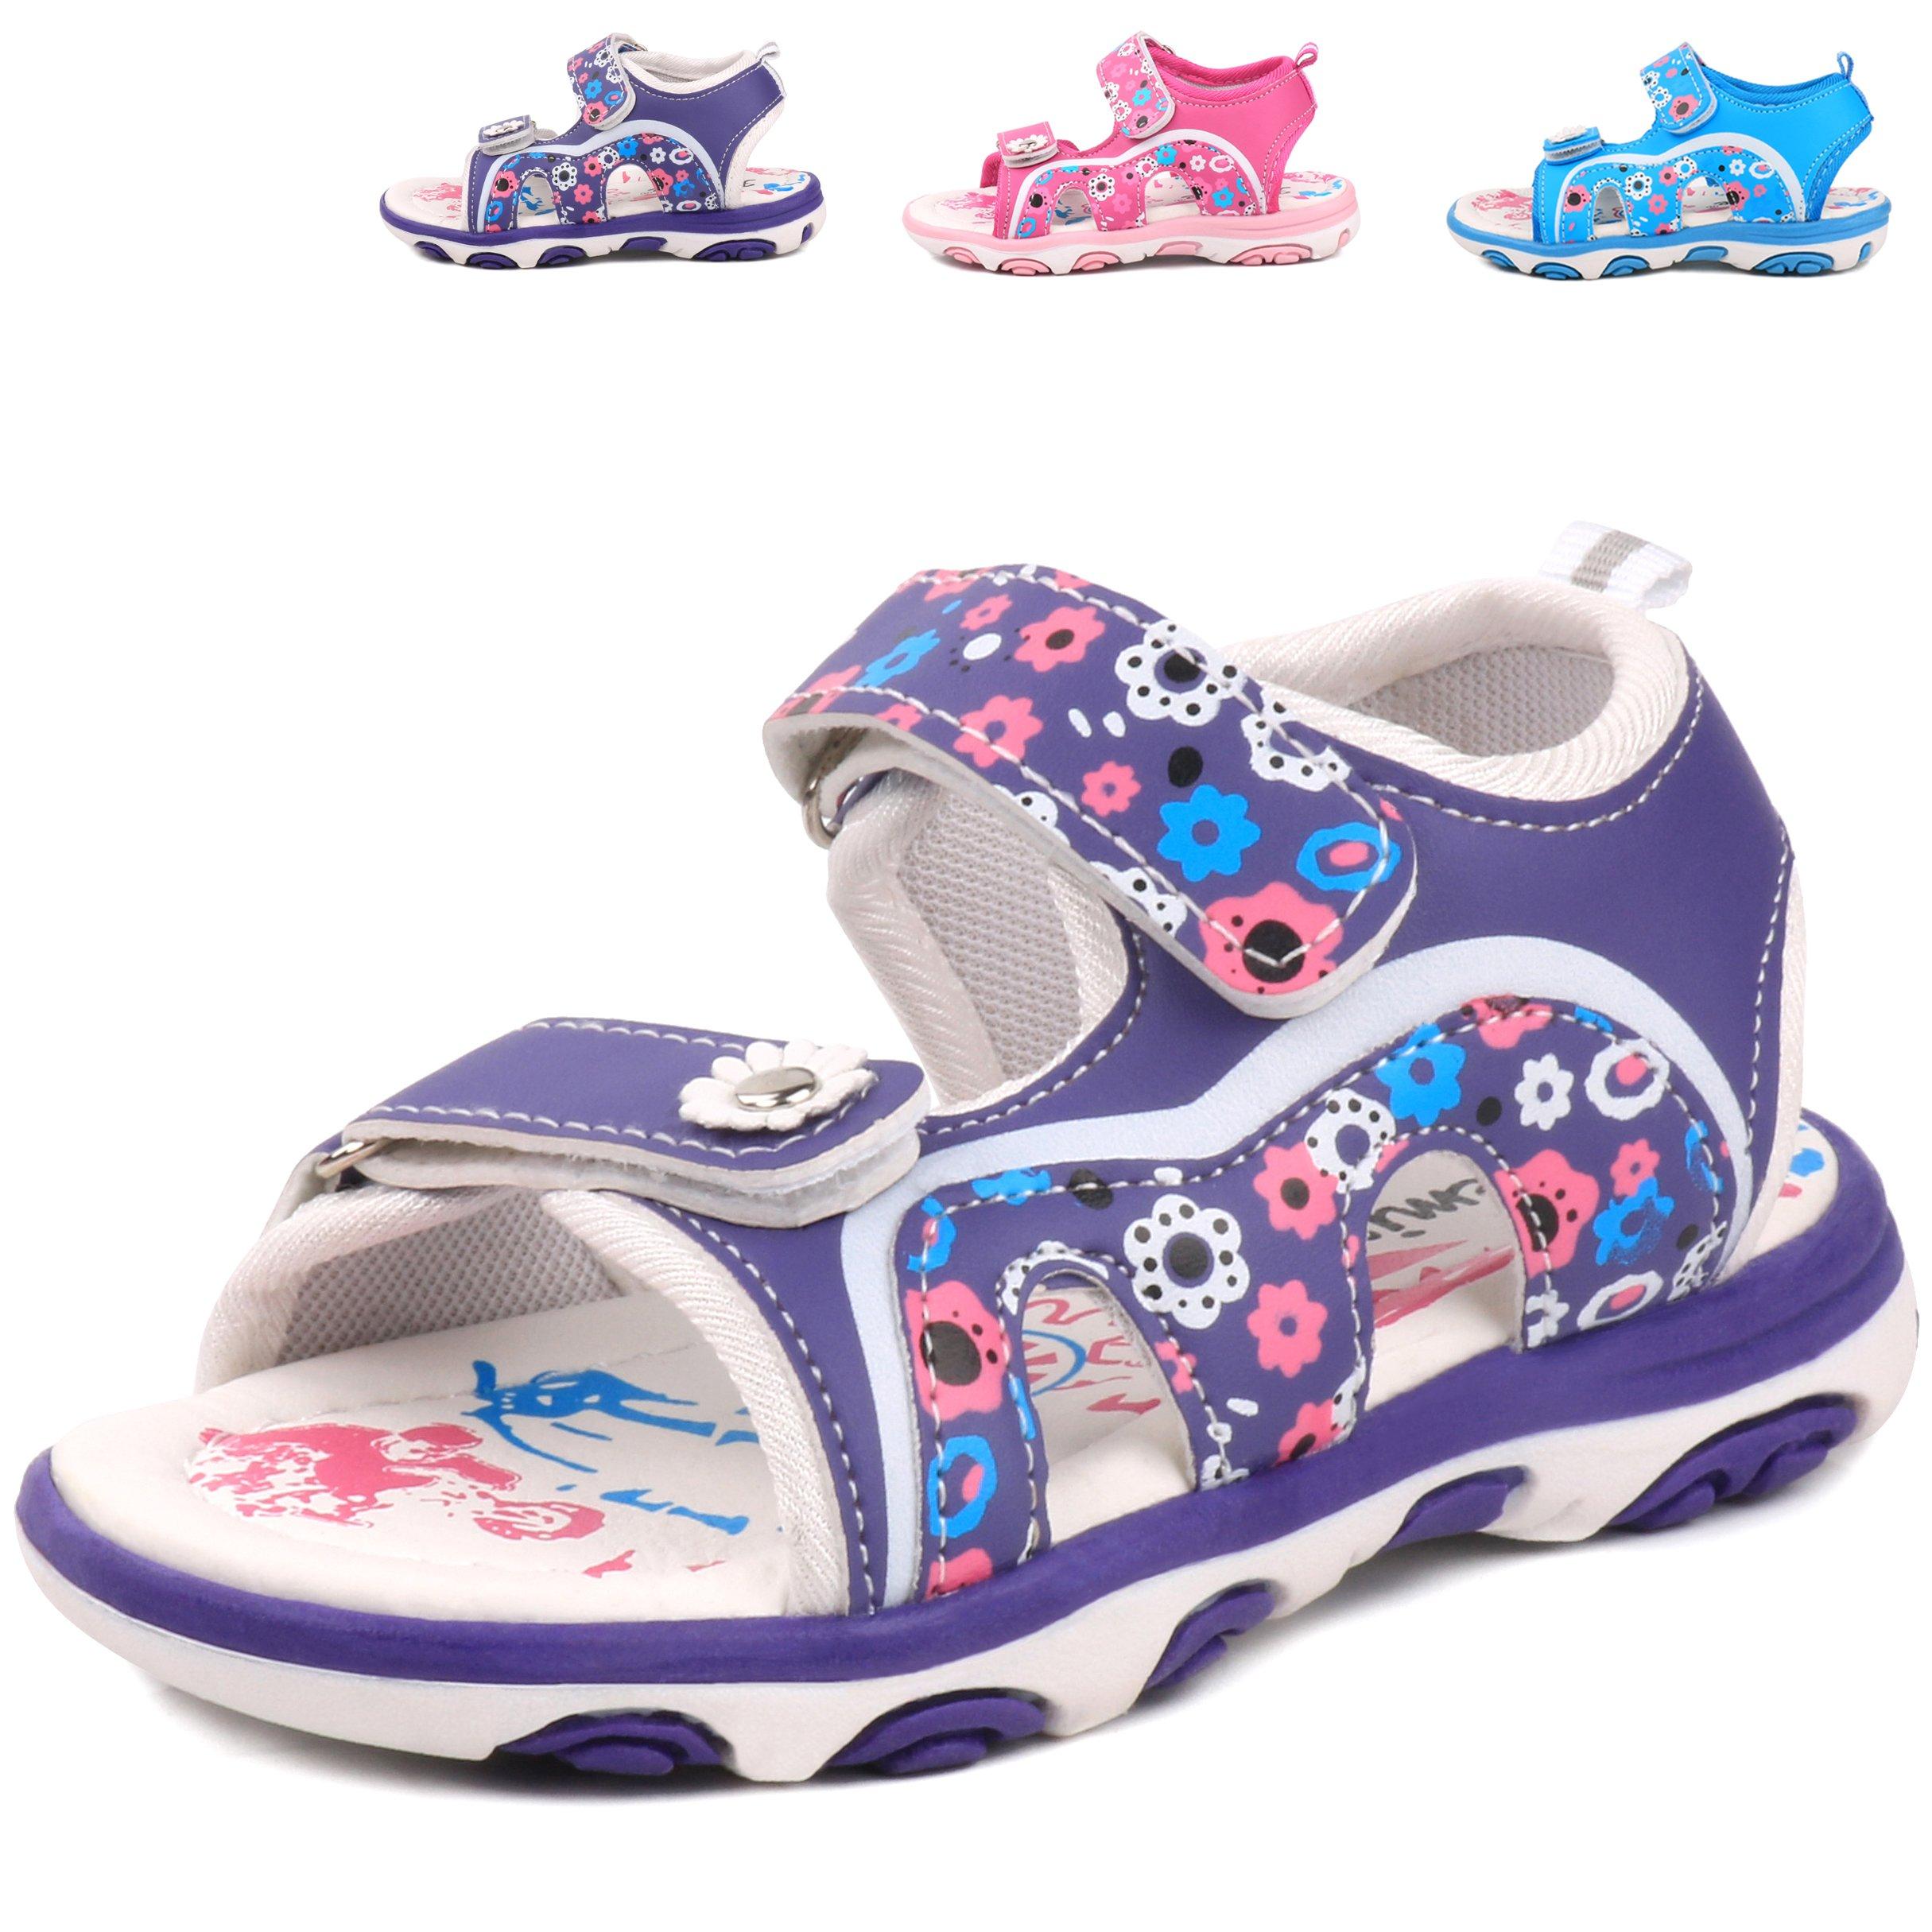 Femizee Girls Outdoor Summer Sandals,Purple,1541 CN22